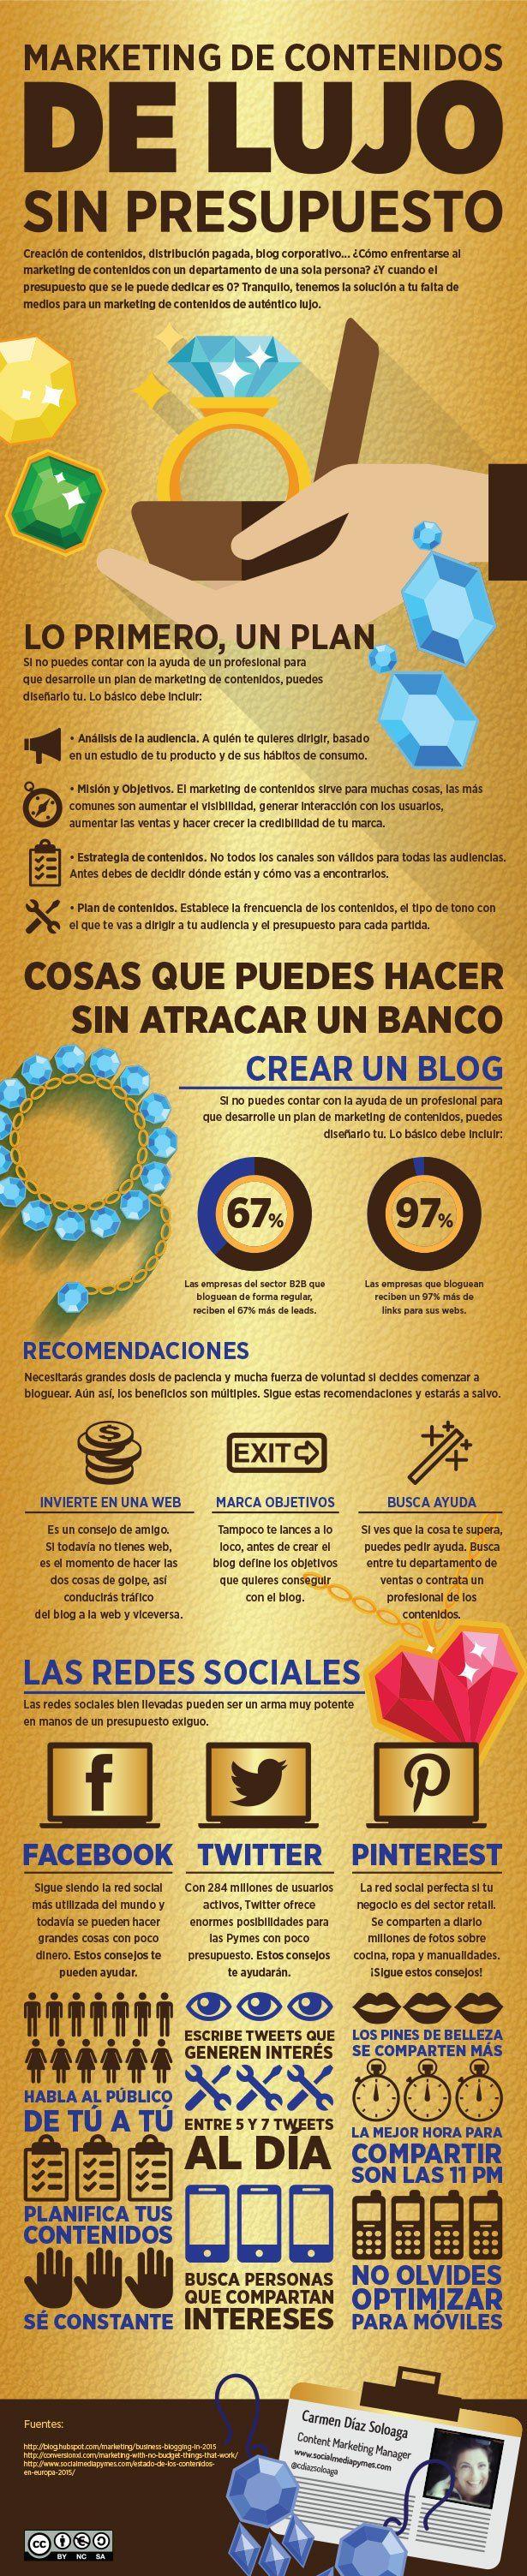 Marketing de Contenidos de Lujo (sin presupuesto) #infografia #infographic #marketing